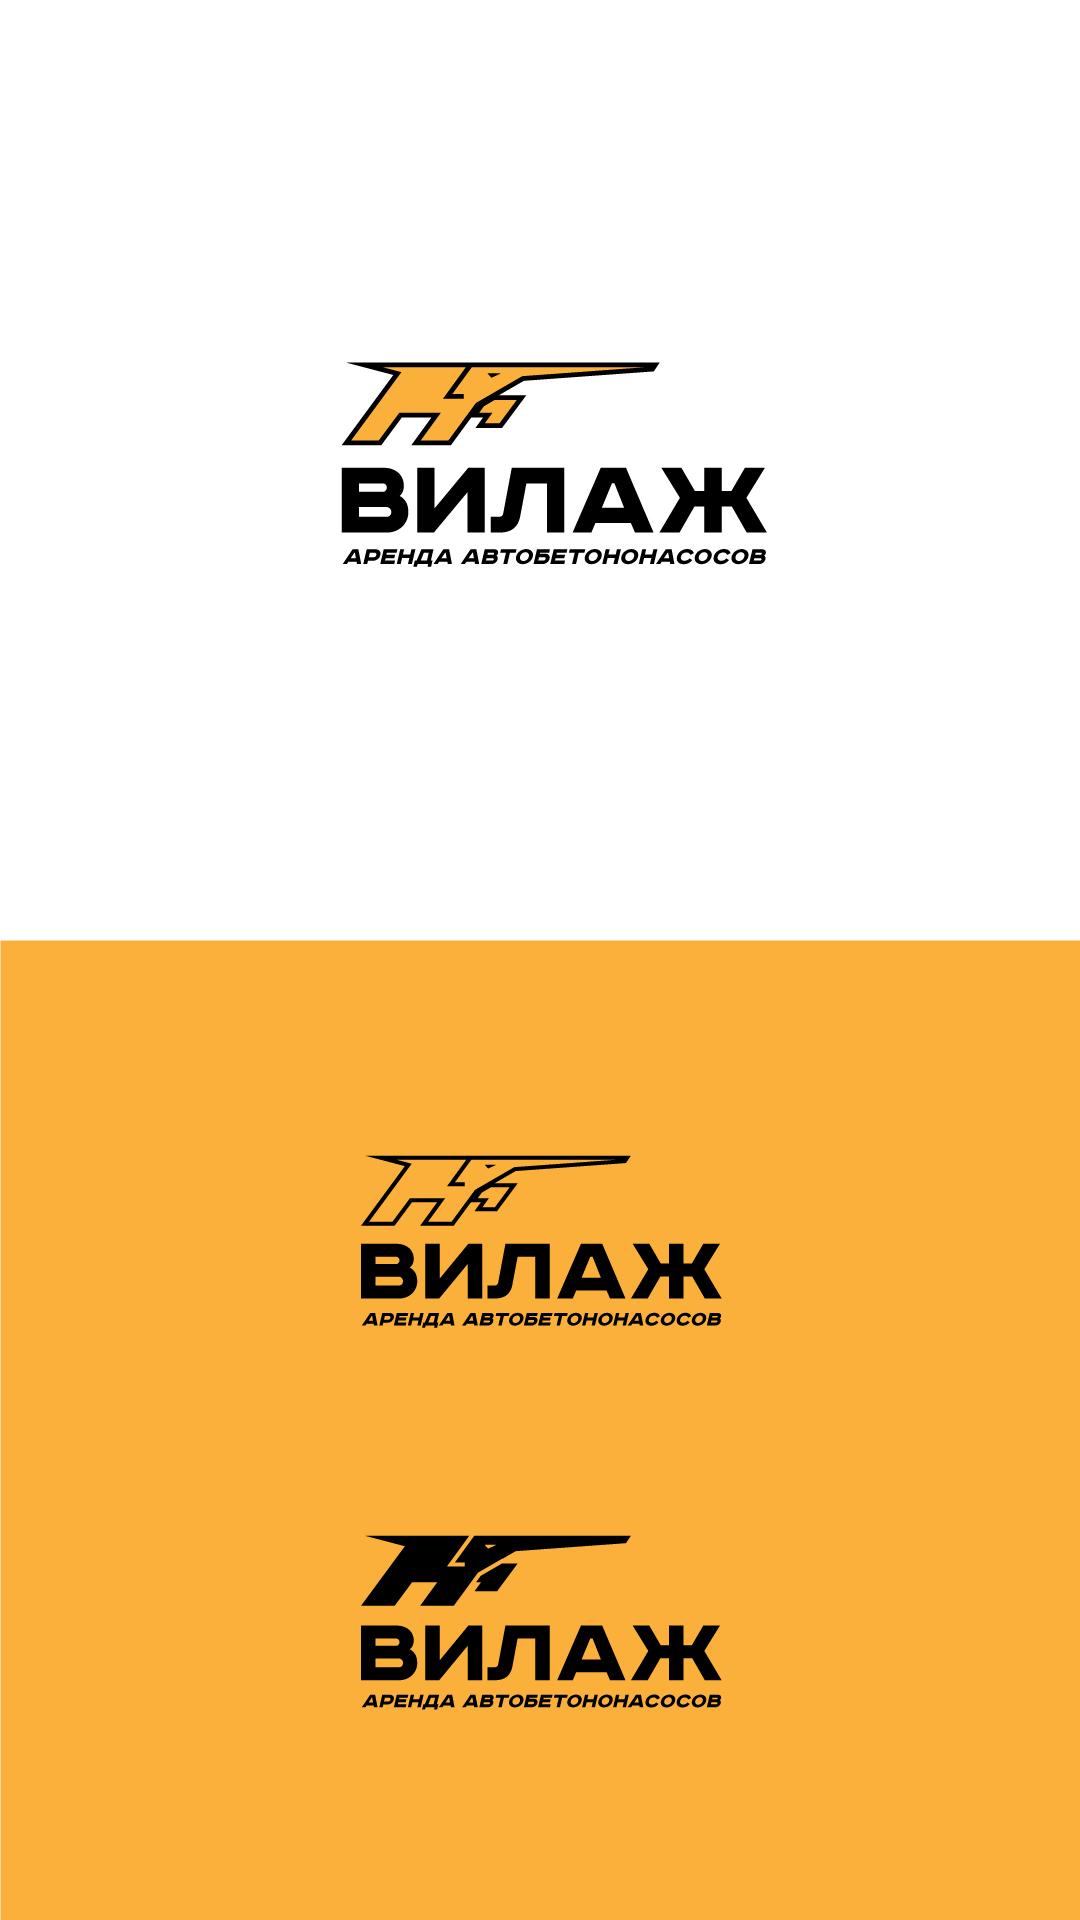 Логотип для компании по аренде спец.техники фото f_068599732c7a4bf5.jpg